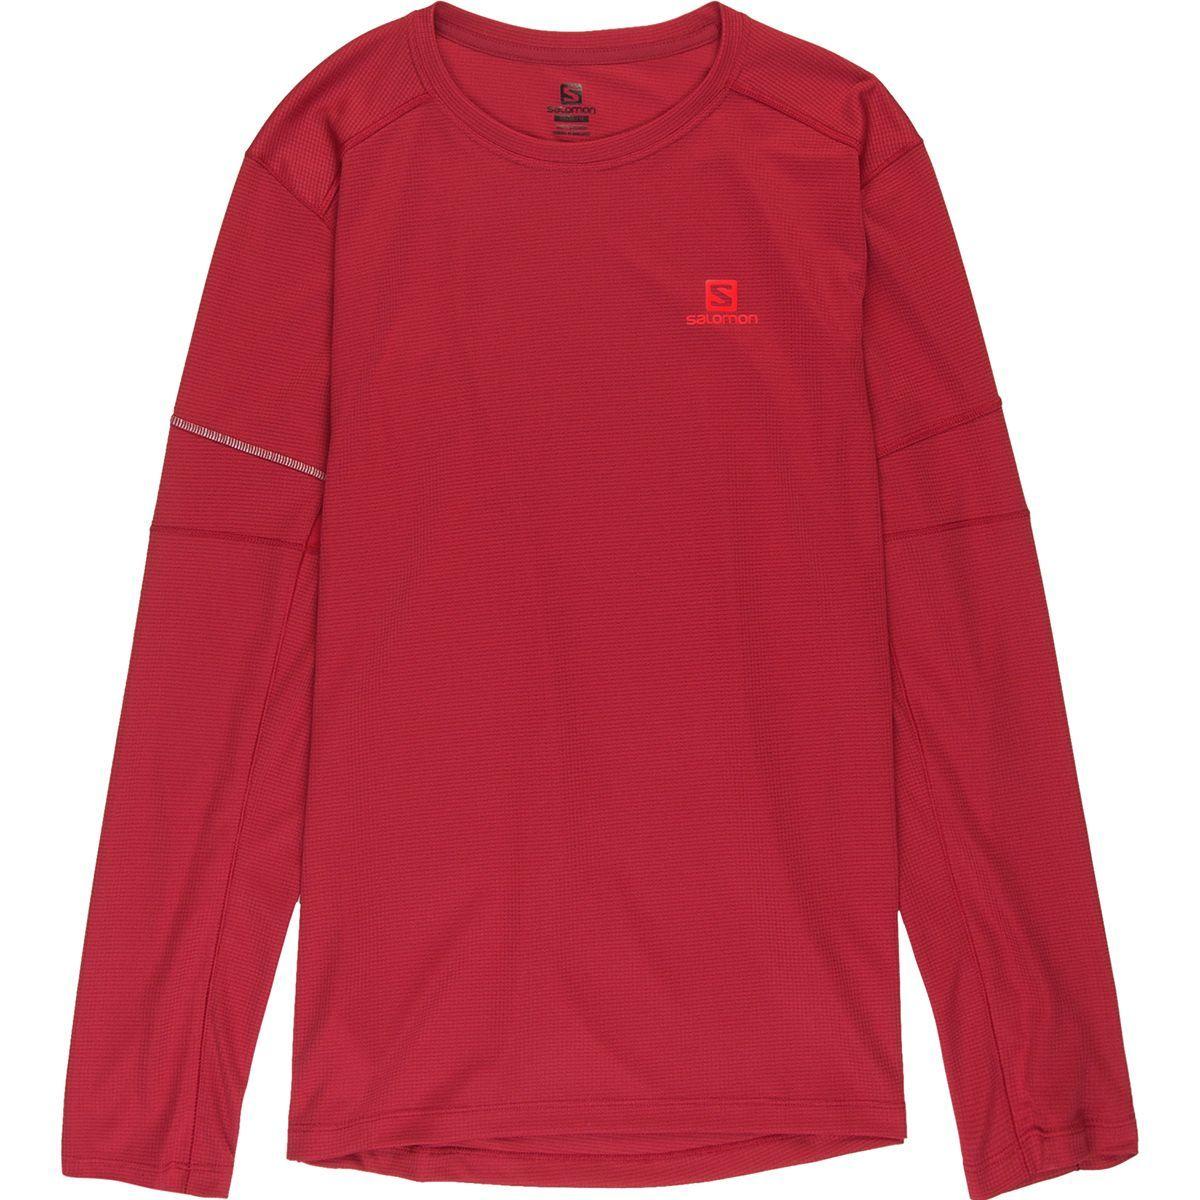 Salomon Agile Long-Sleeve T-Shirt - Men's